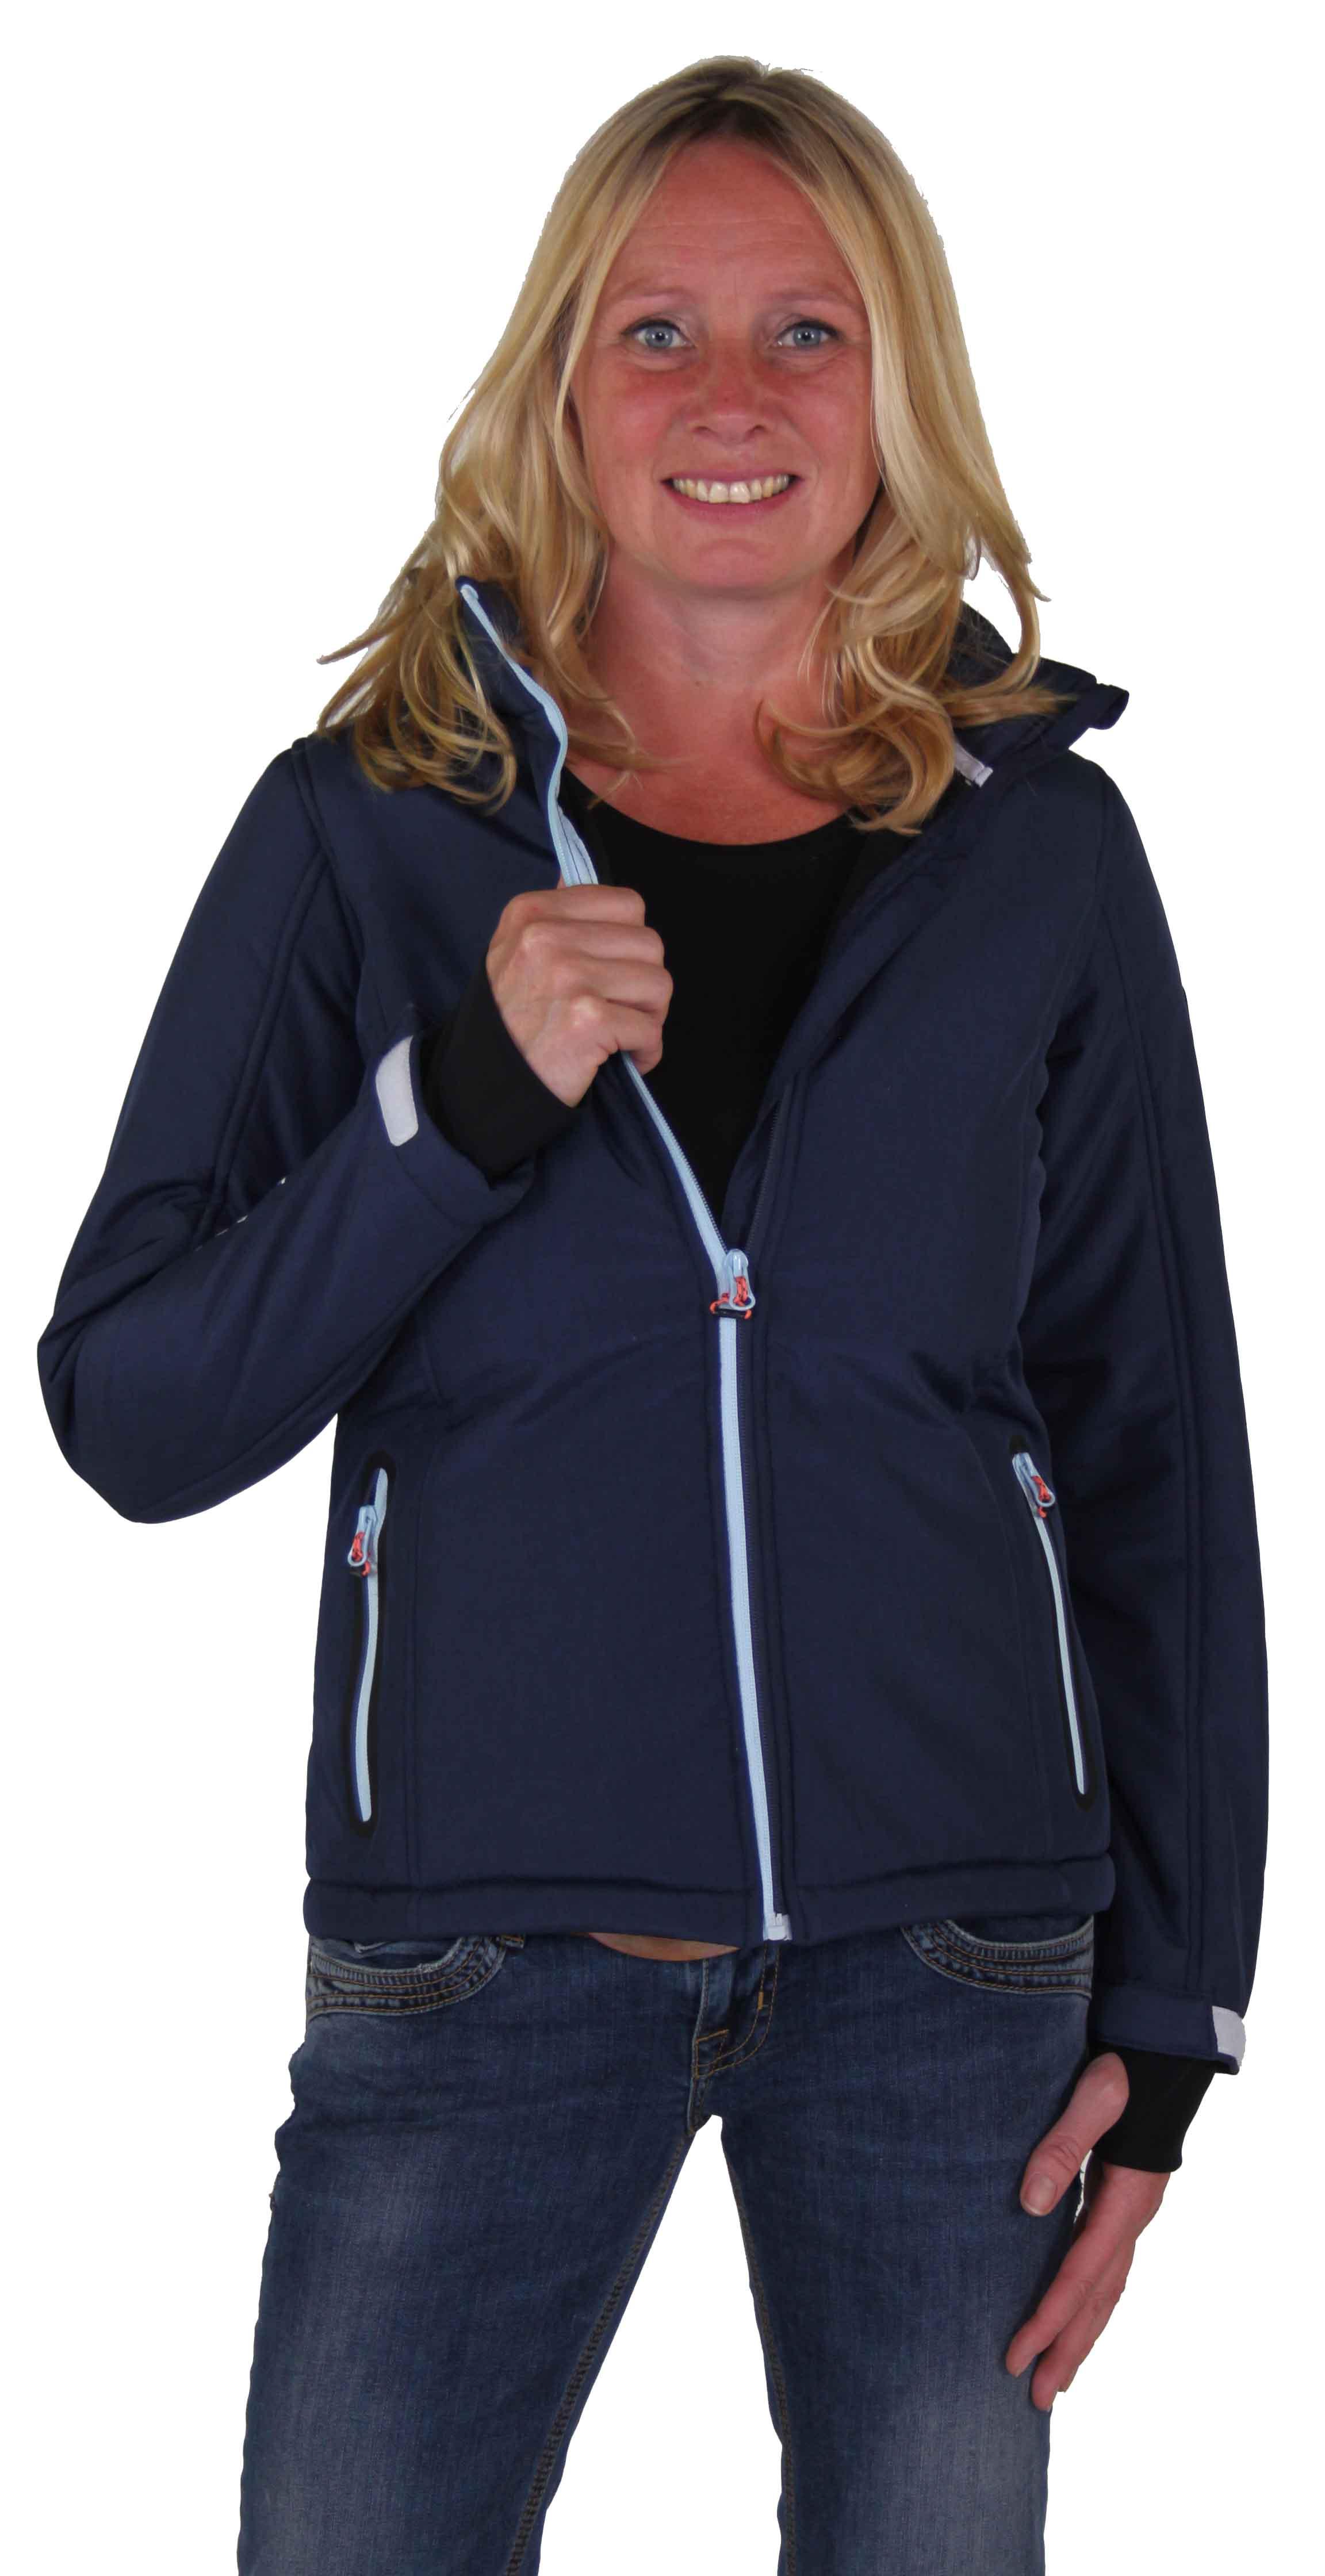 Donkerblauwe teddy gevoerde dames softshell jas winter kopen? - Outdoorkleding - Bjornson.nl